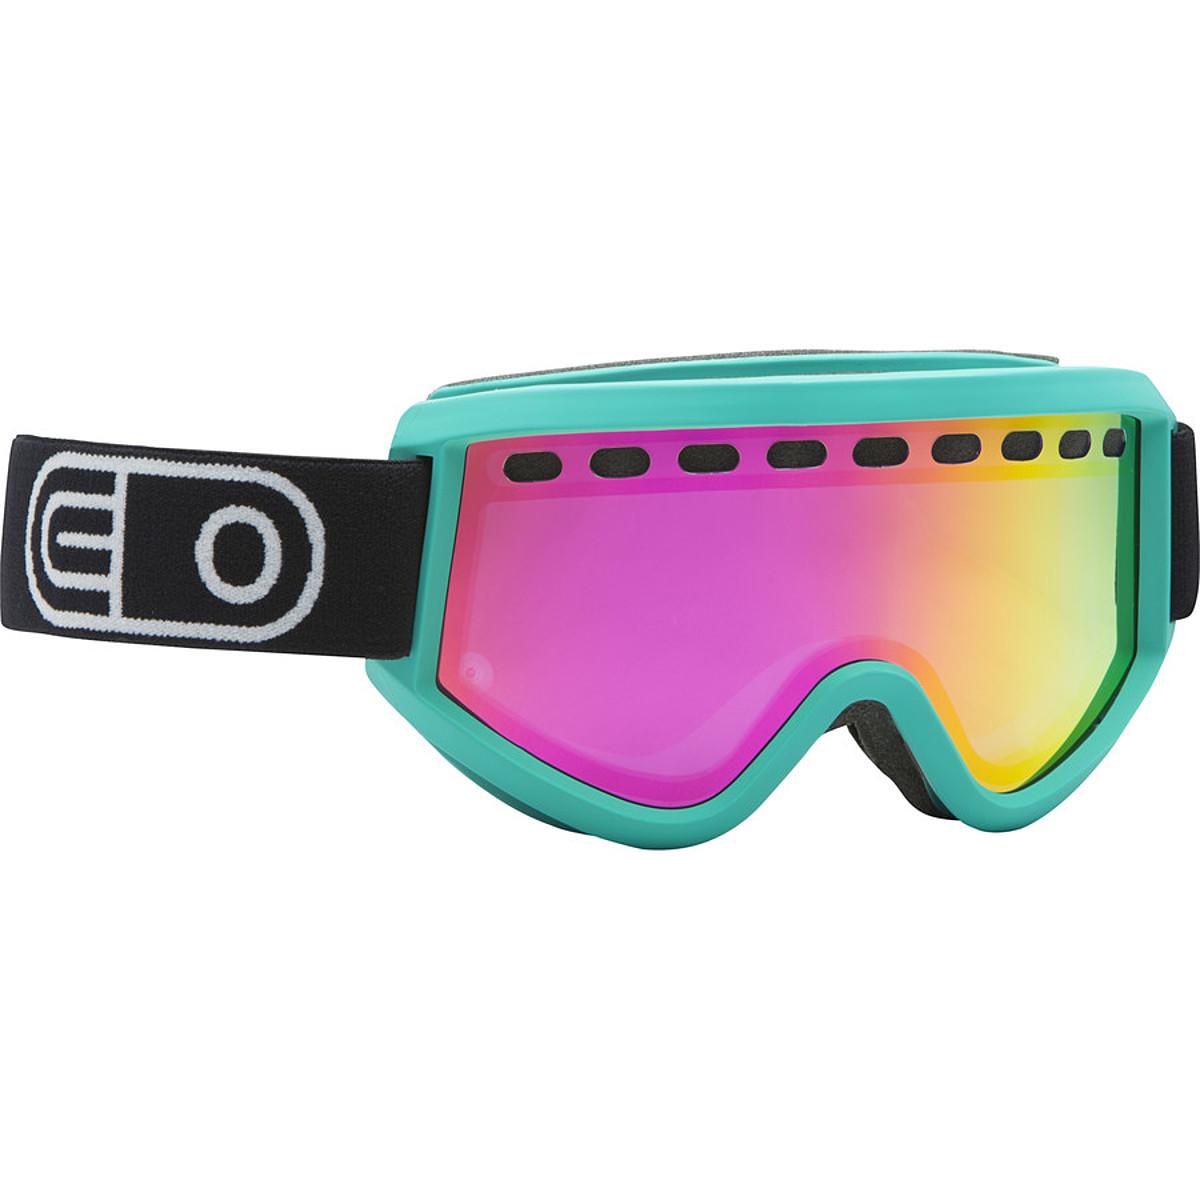 Airblaster Airpill Goggle